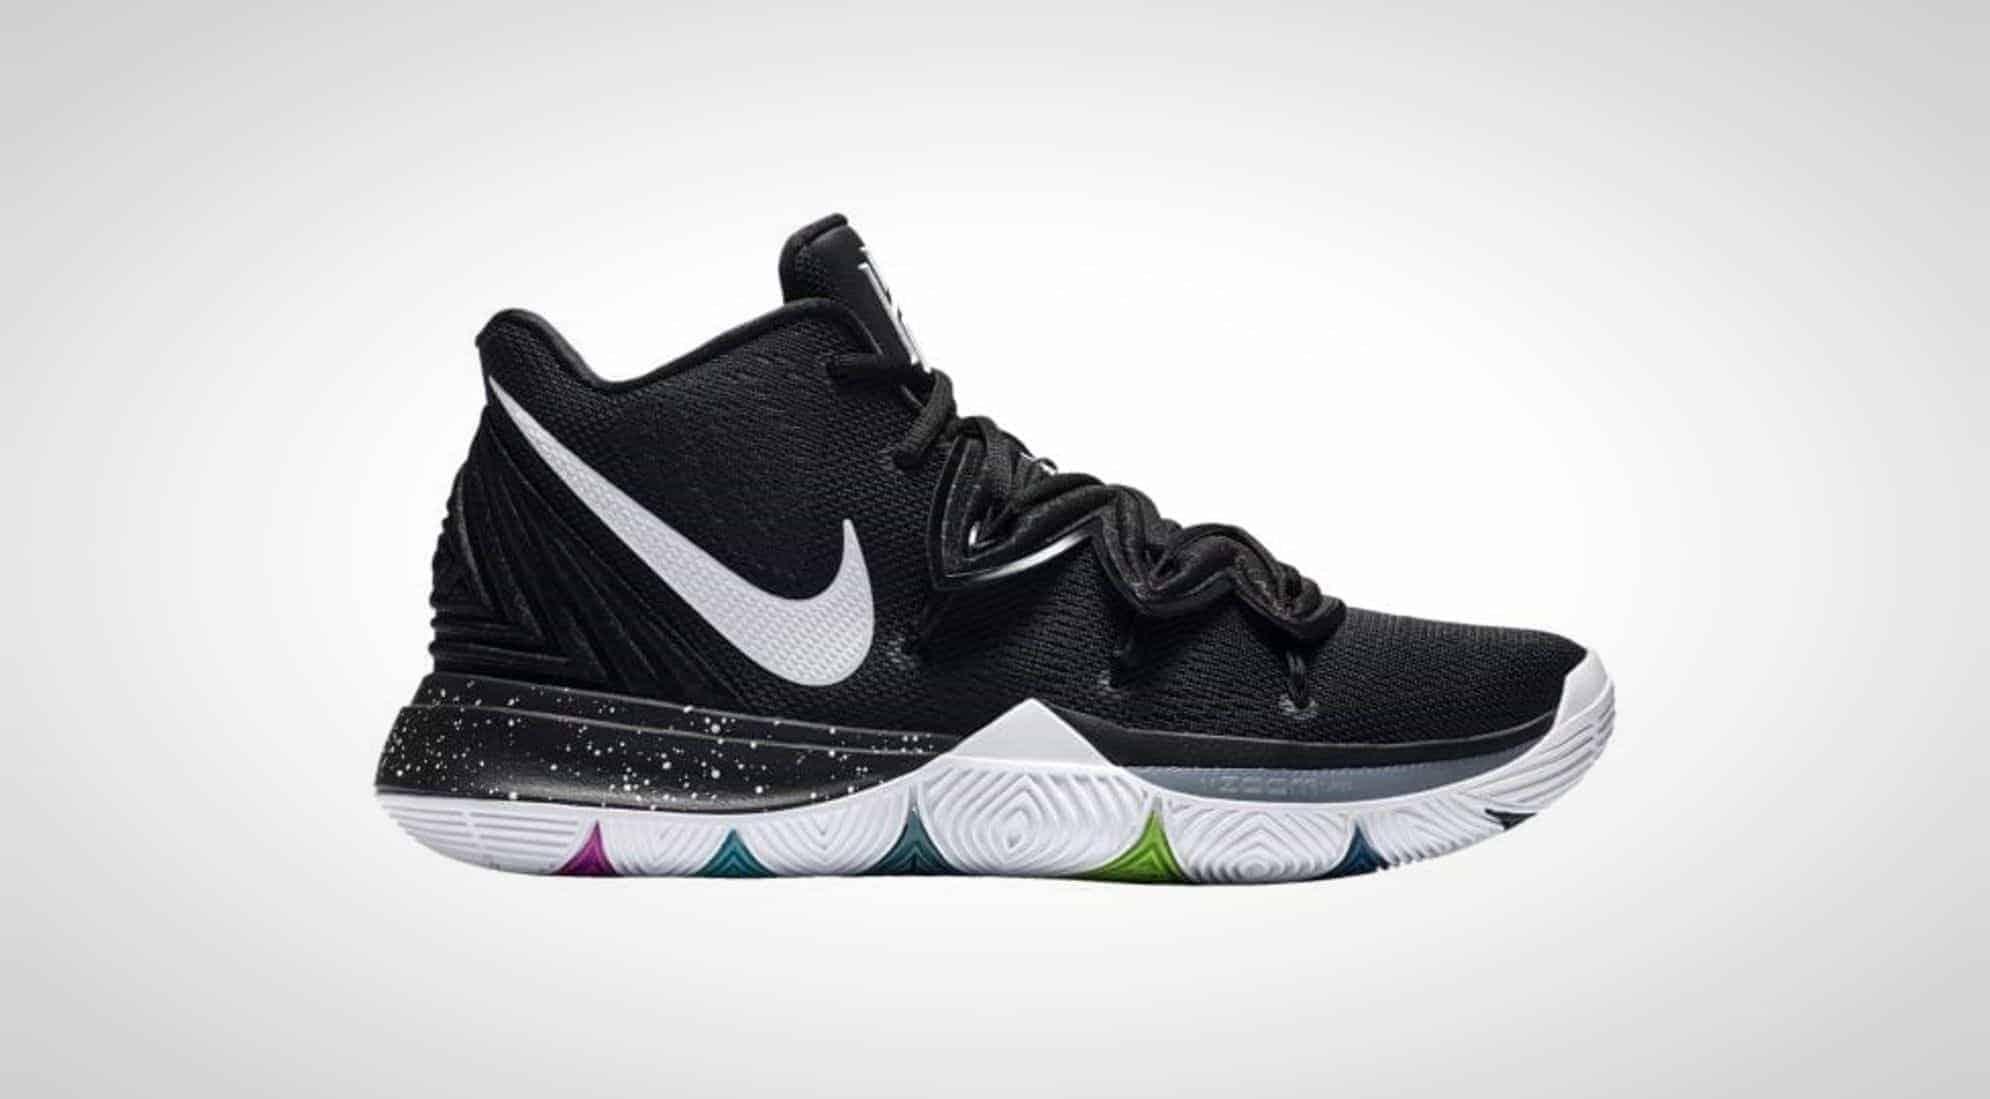 53af25ac77ba4 Nike Kyrie 5 Performance Review - BestOutdoorBasketball